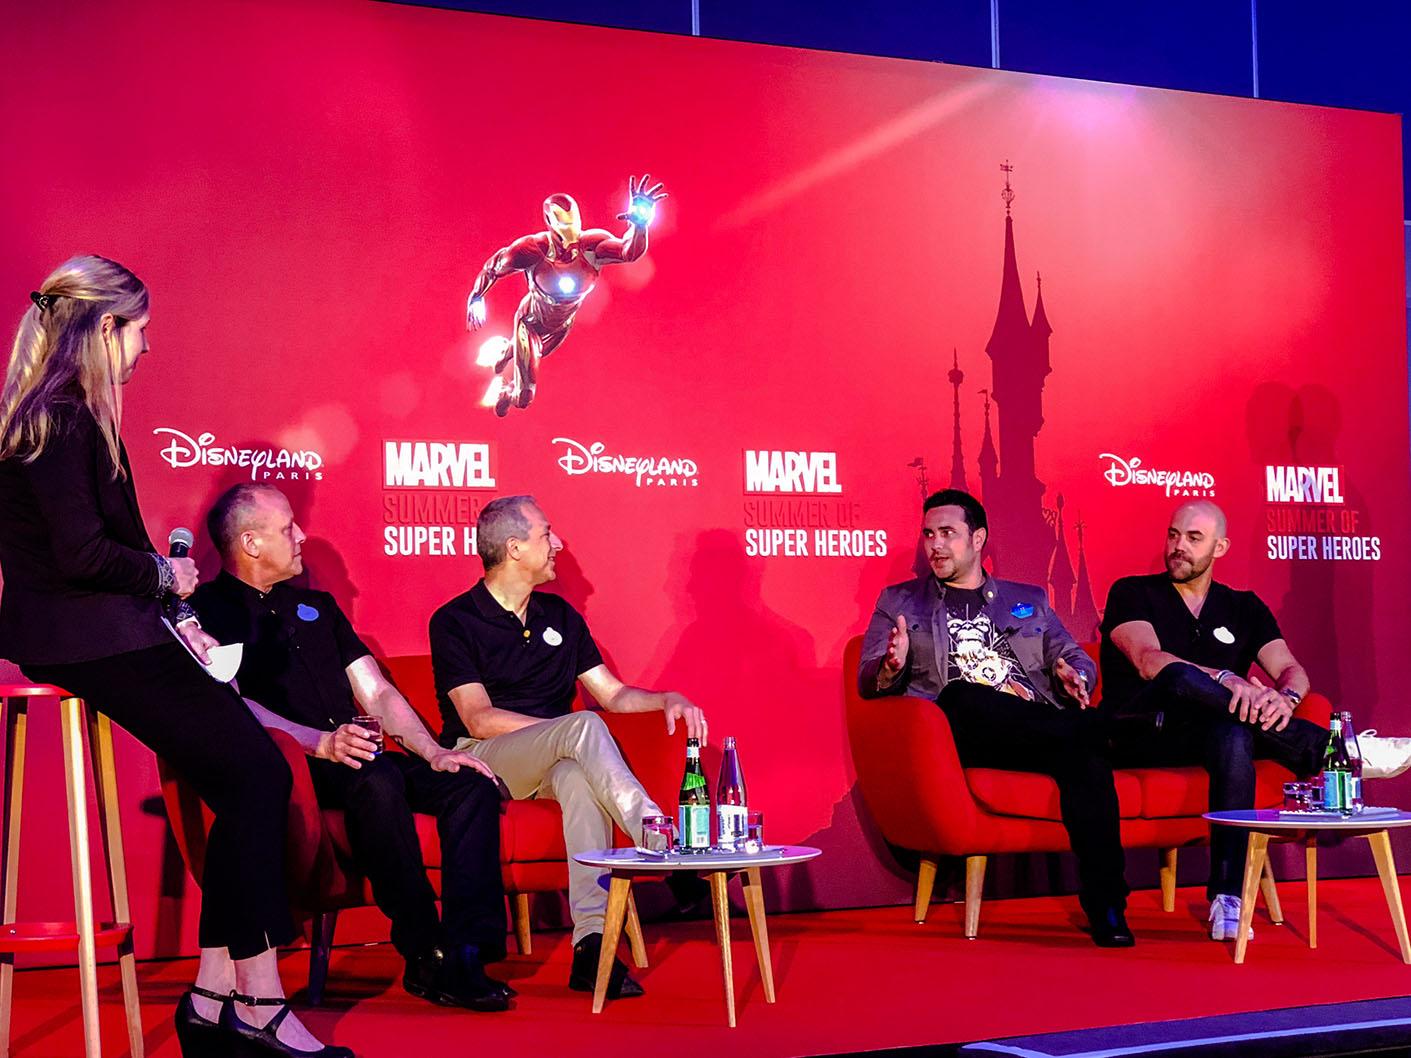 Marvel Summer of Super Heroes Press Conference at Disneyland Paris